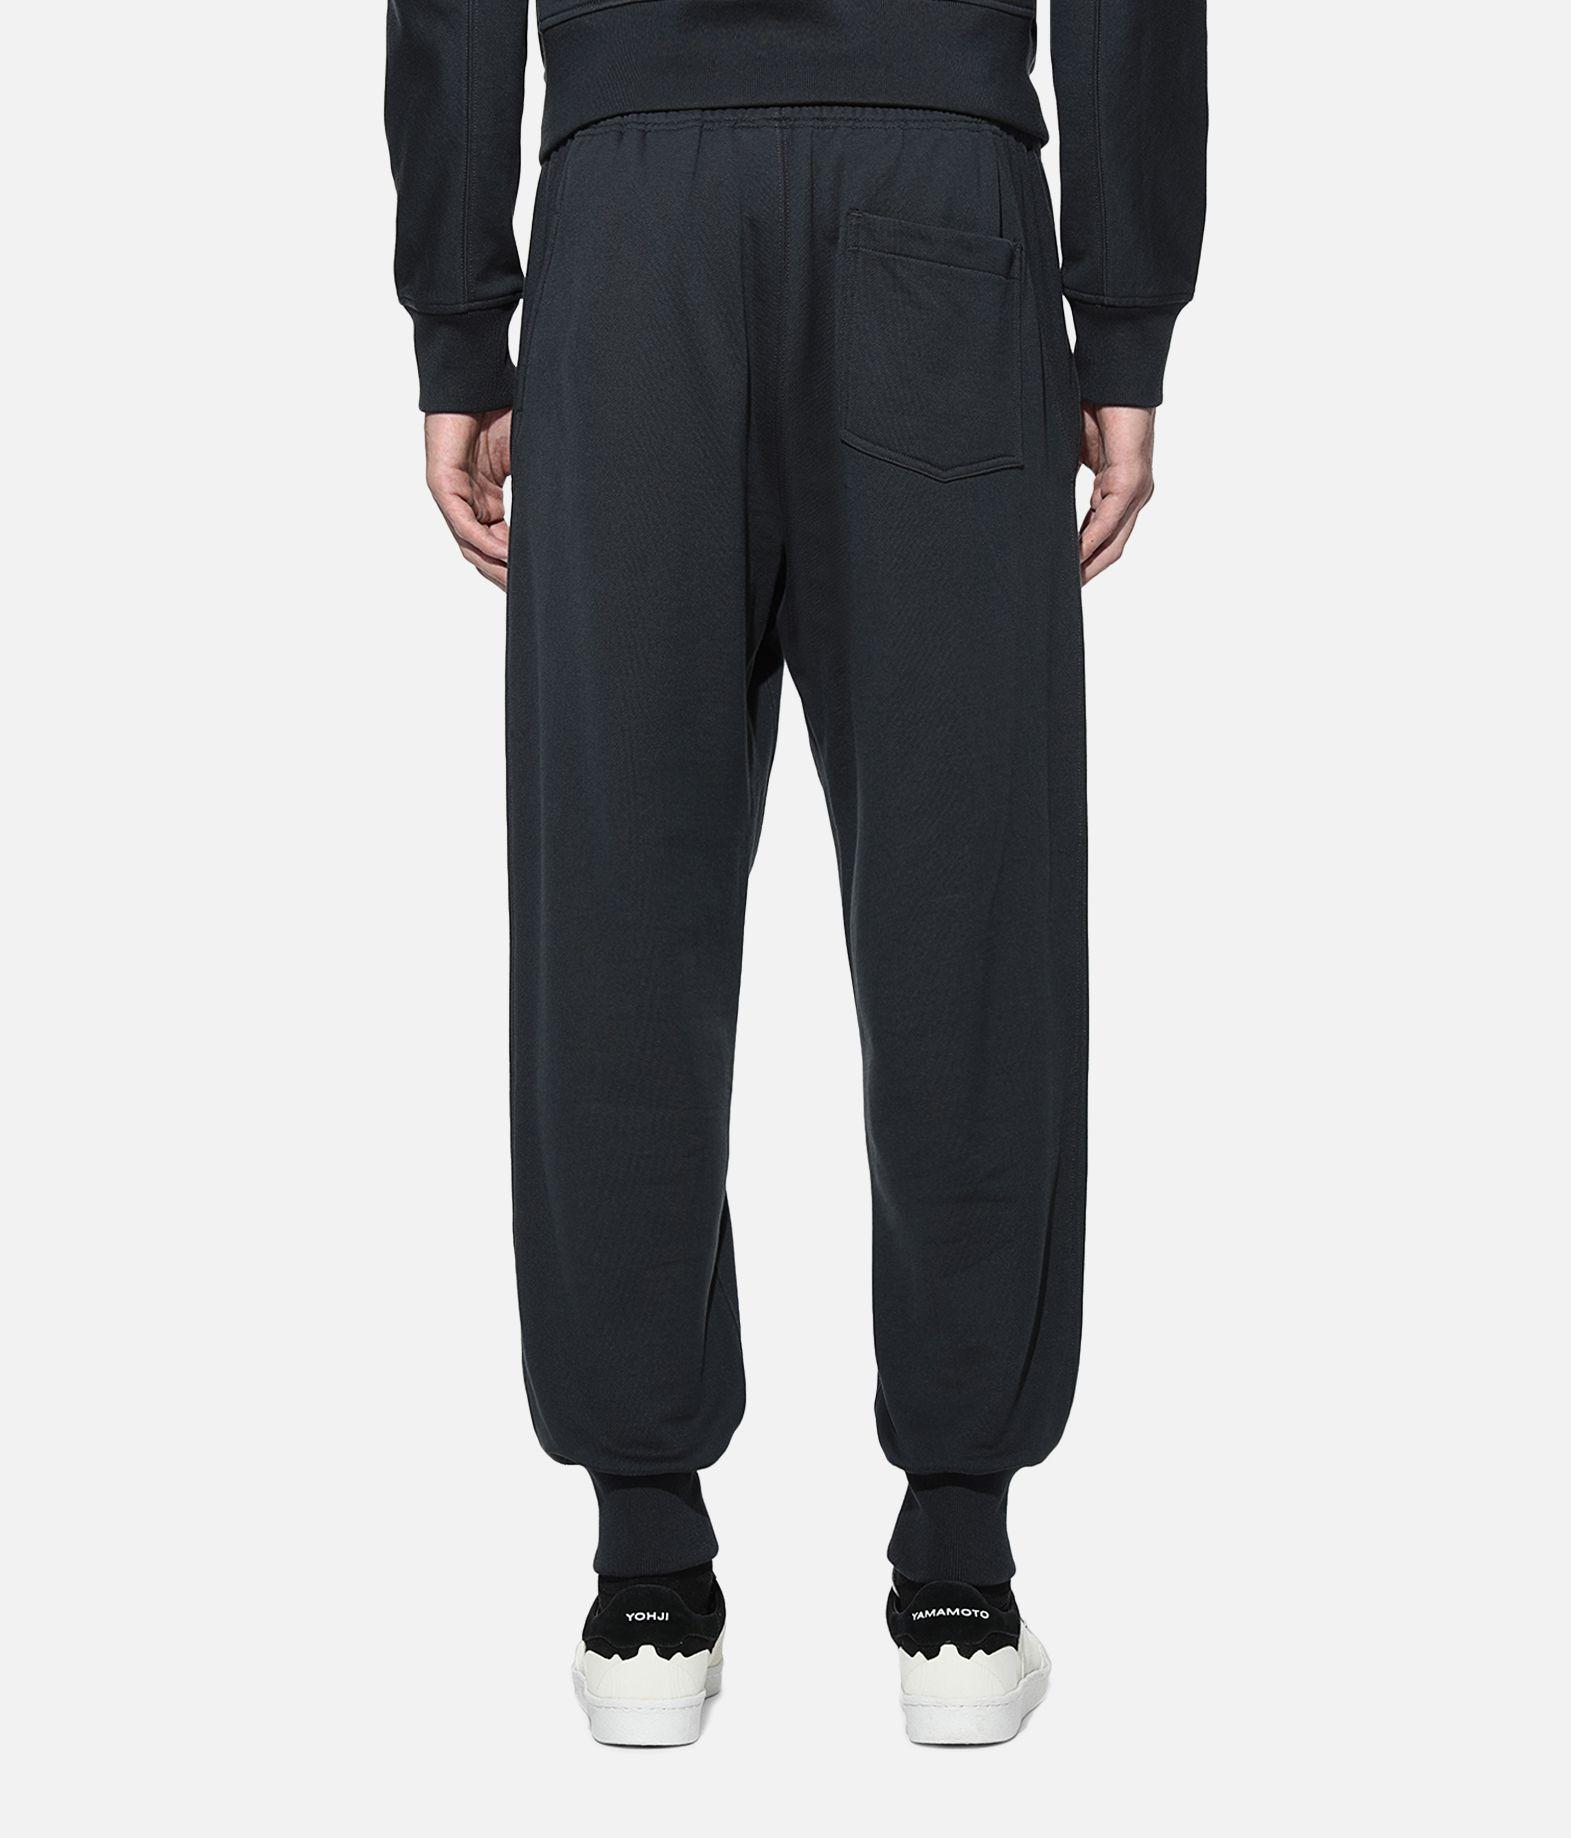 Y-3 Y-3 Classic Cuffed Pants スウェットパンツ メンズ d